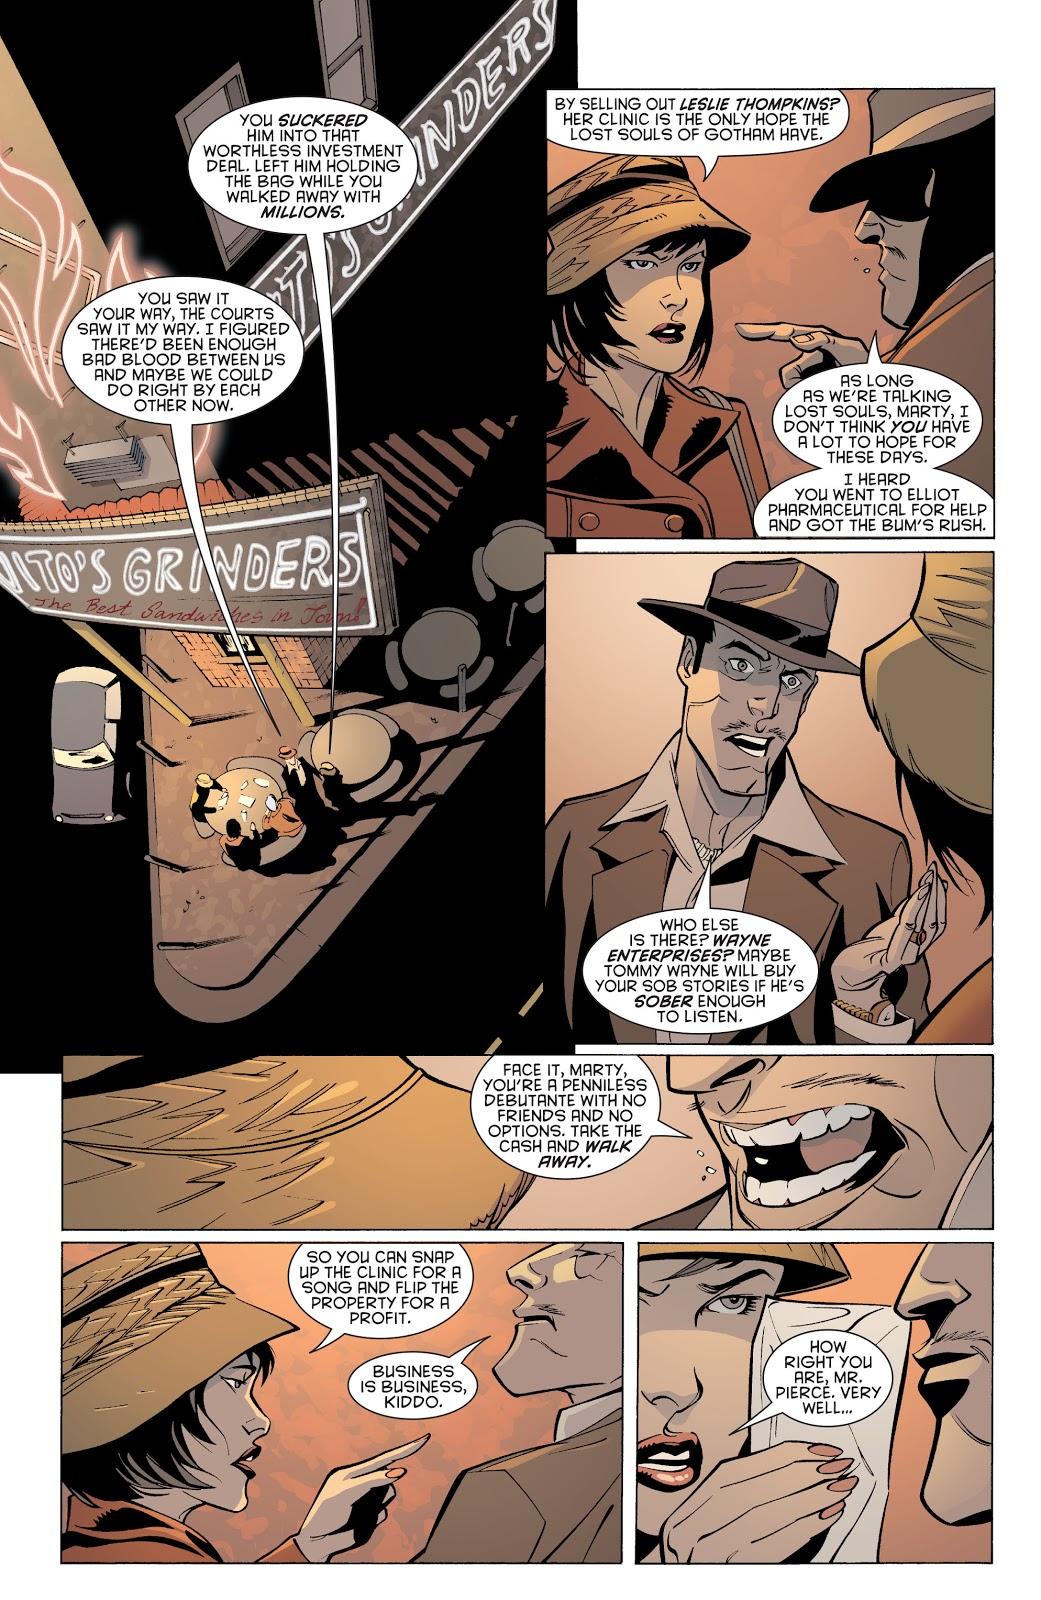 Batman Streets of Gotham House of Hush review